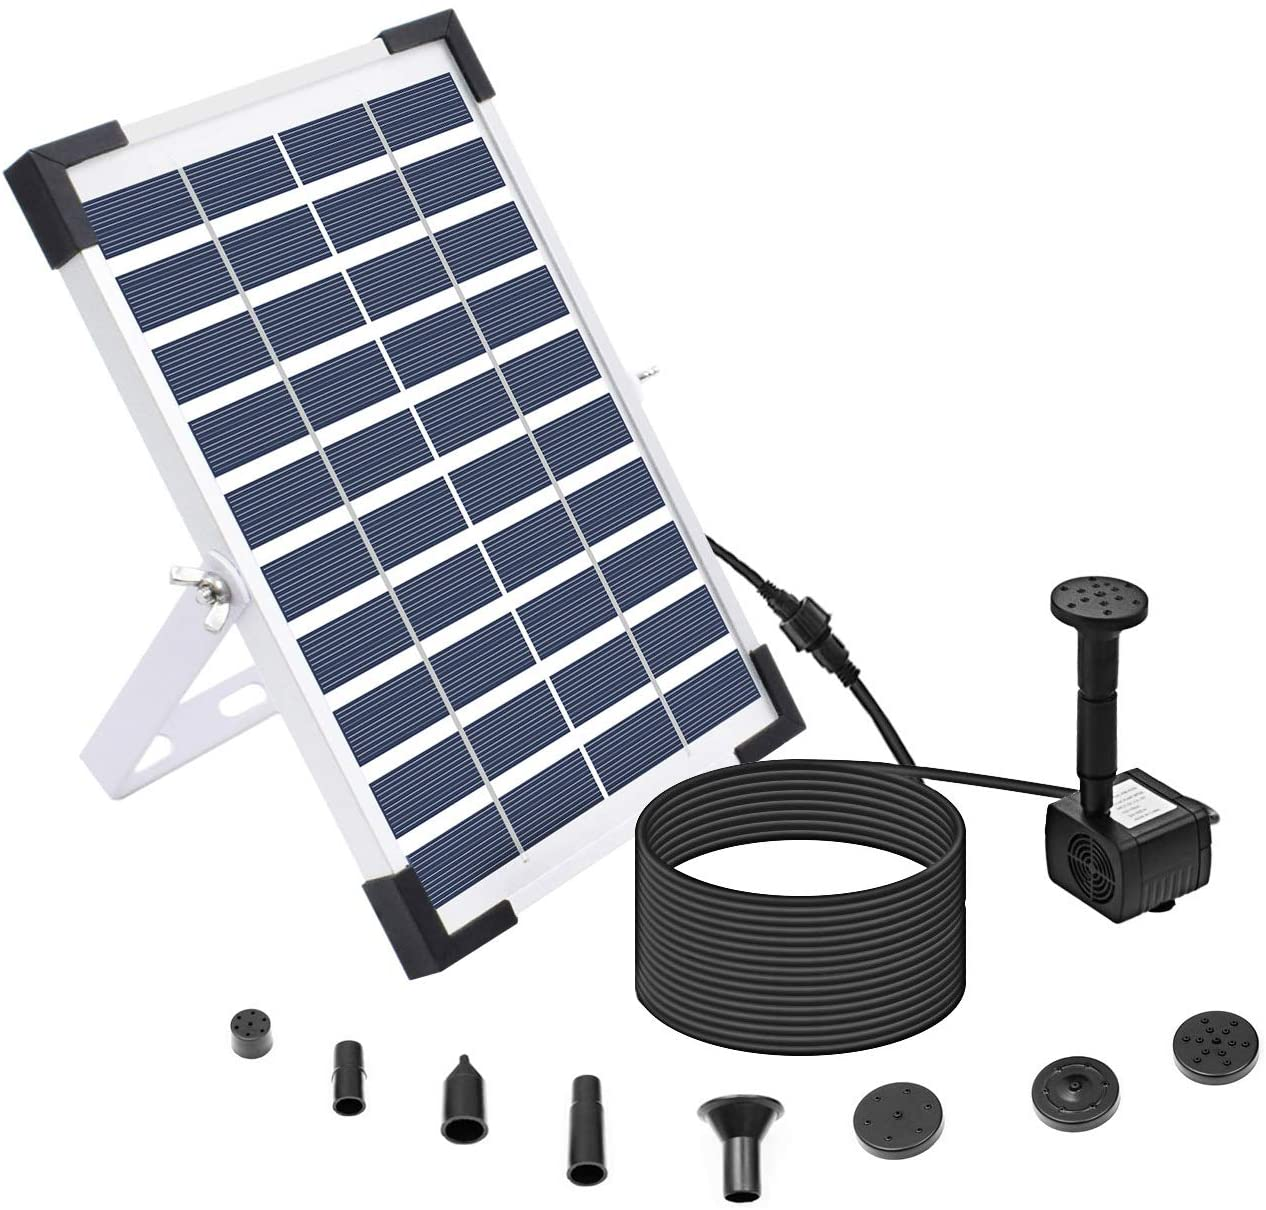 Lewisia 5W Solar Fountain Pump for Pool Koi Pond Water Pump Kit